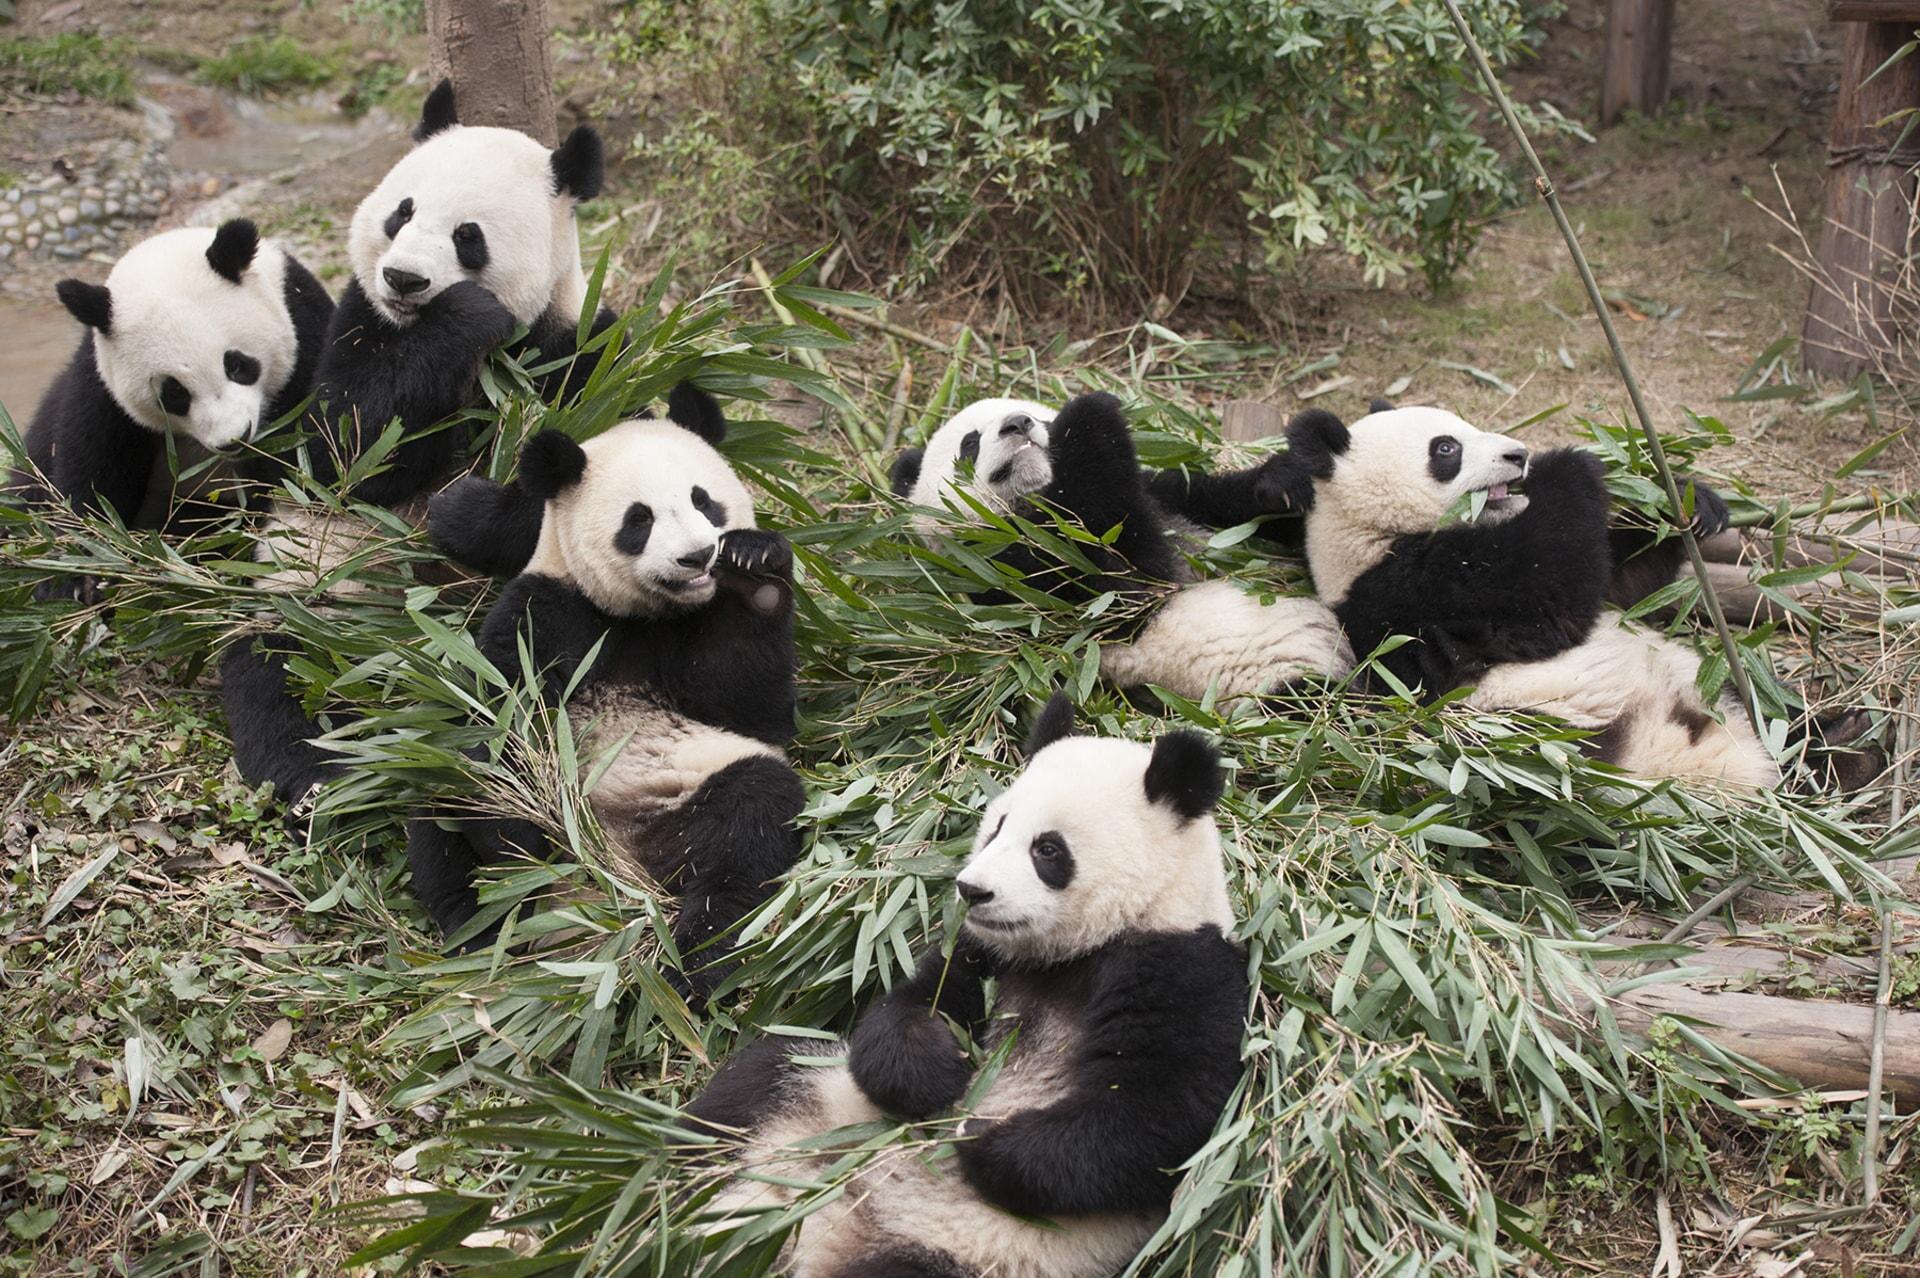 Giant Pandas at China's Chengdu Panda Base as seen in the new IMAX® film, PANDAS